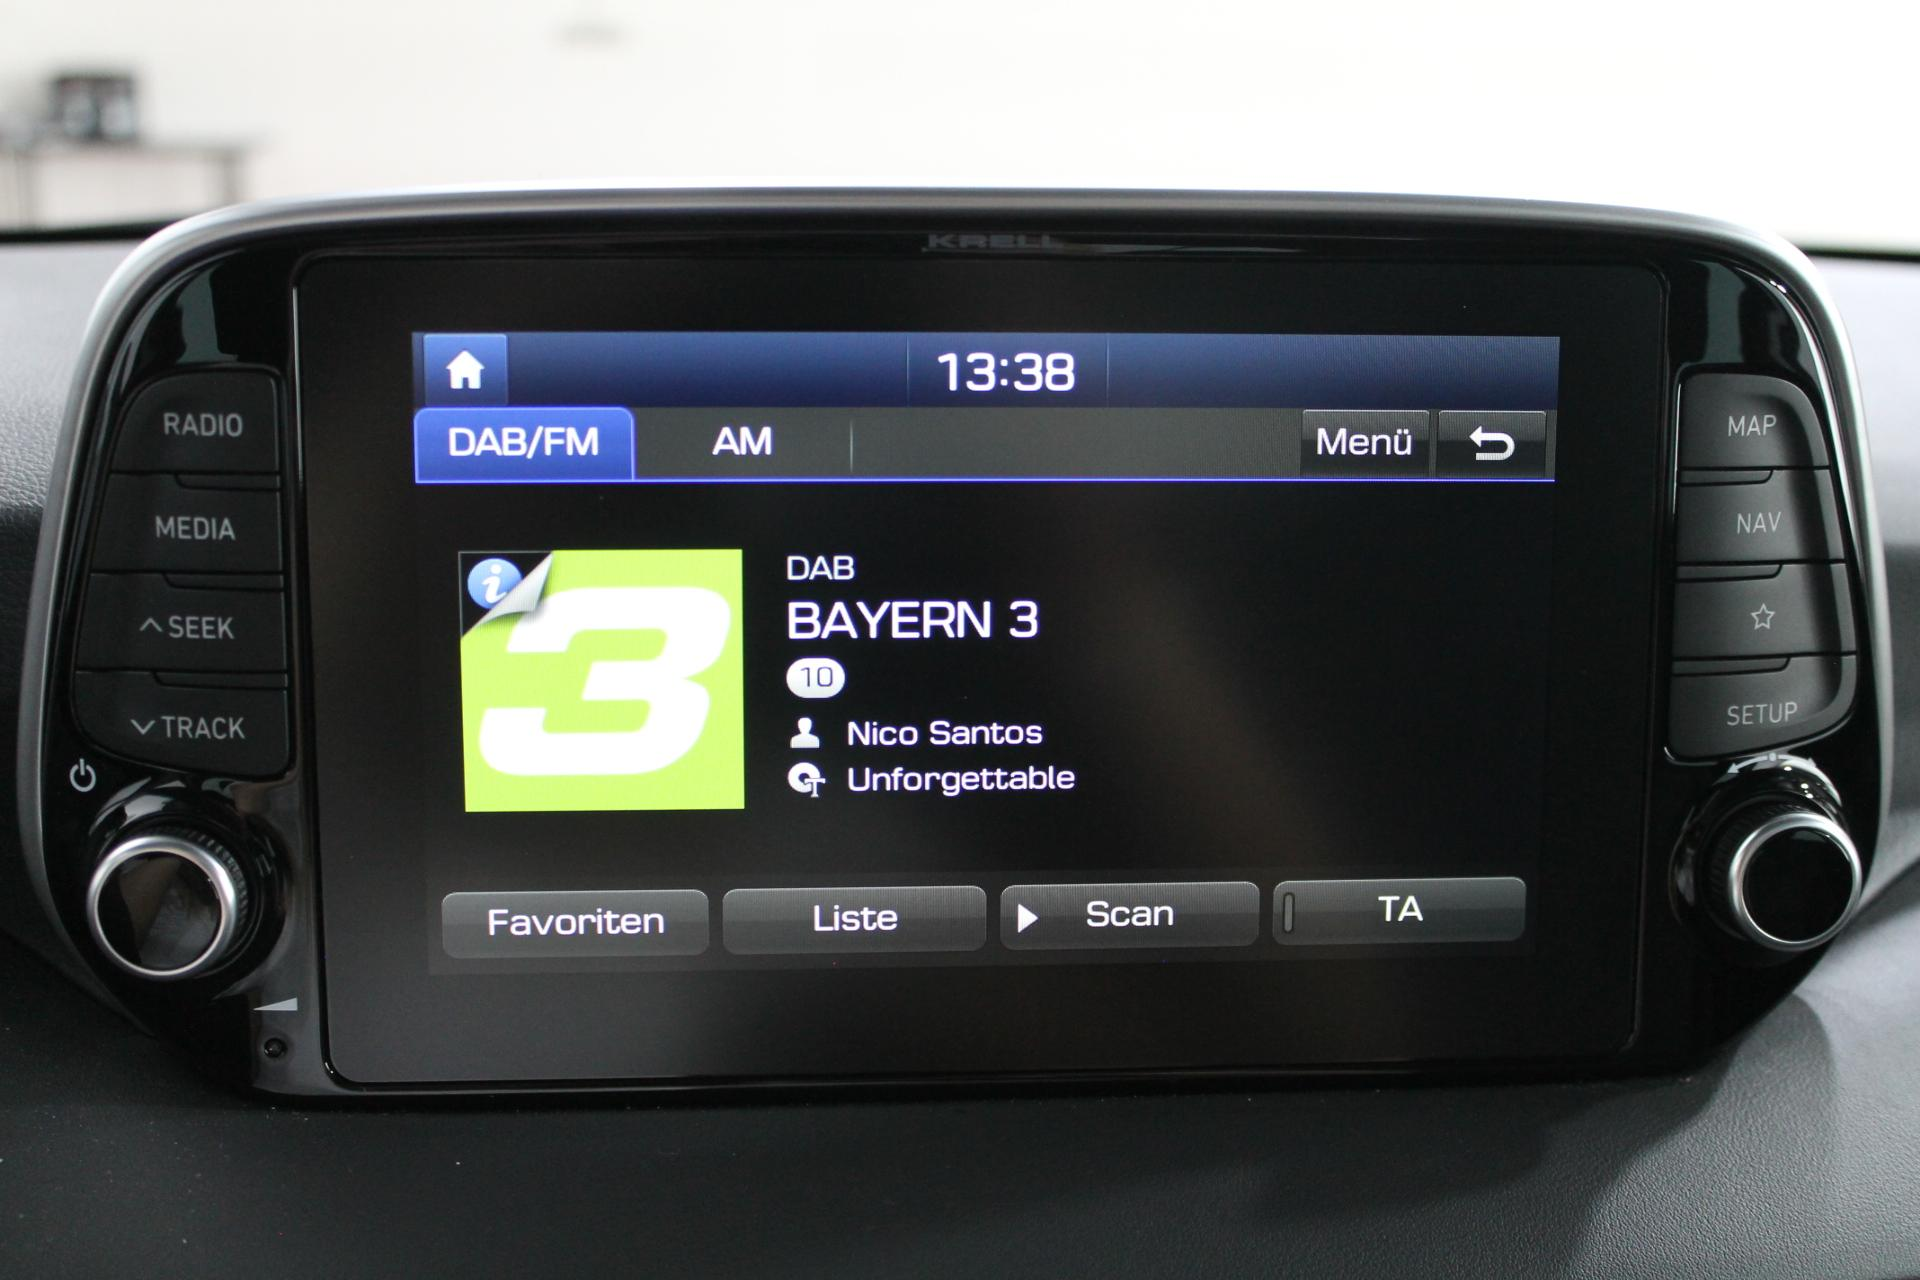 Hyundai hidden menu. Source: autowelt-simon.de